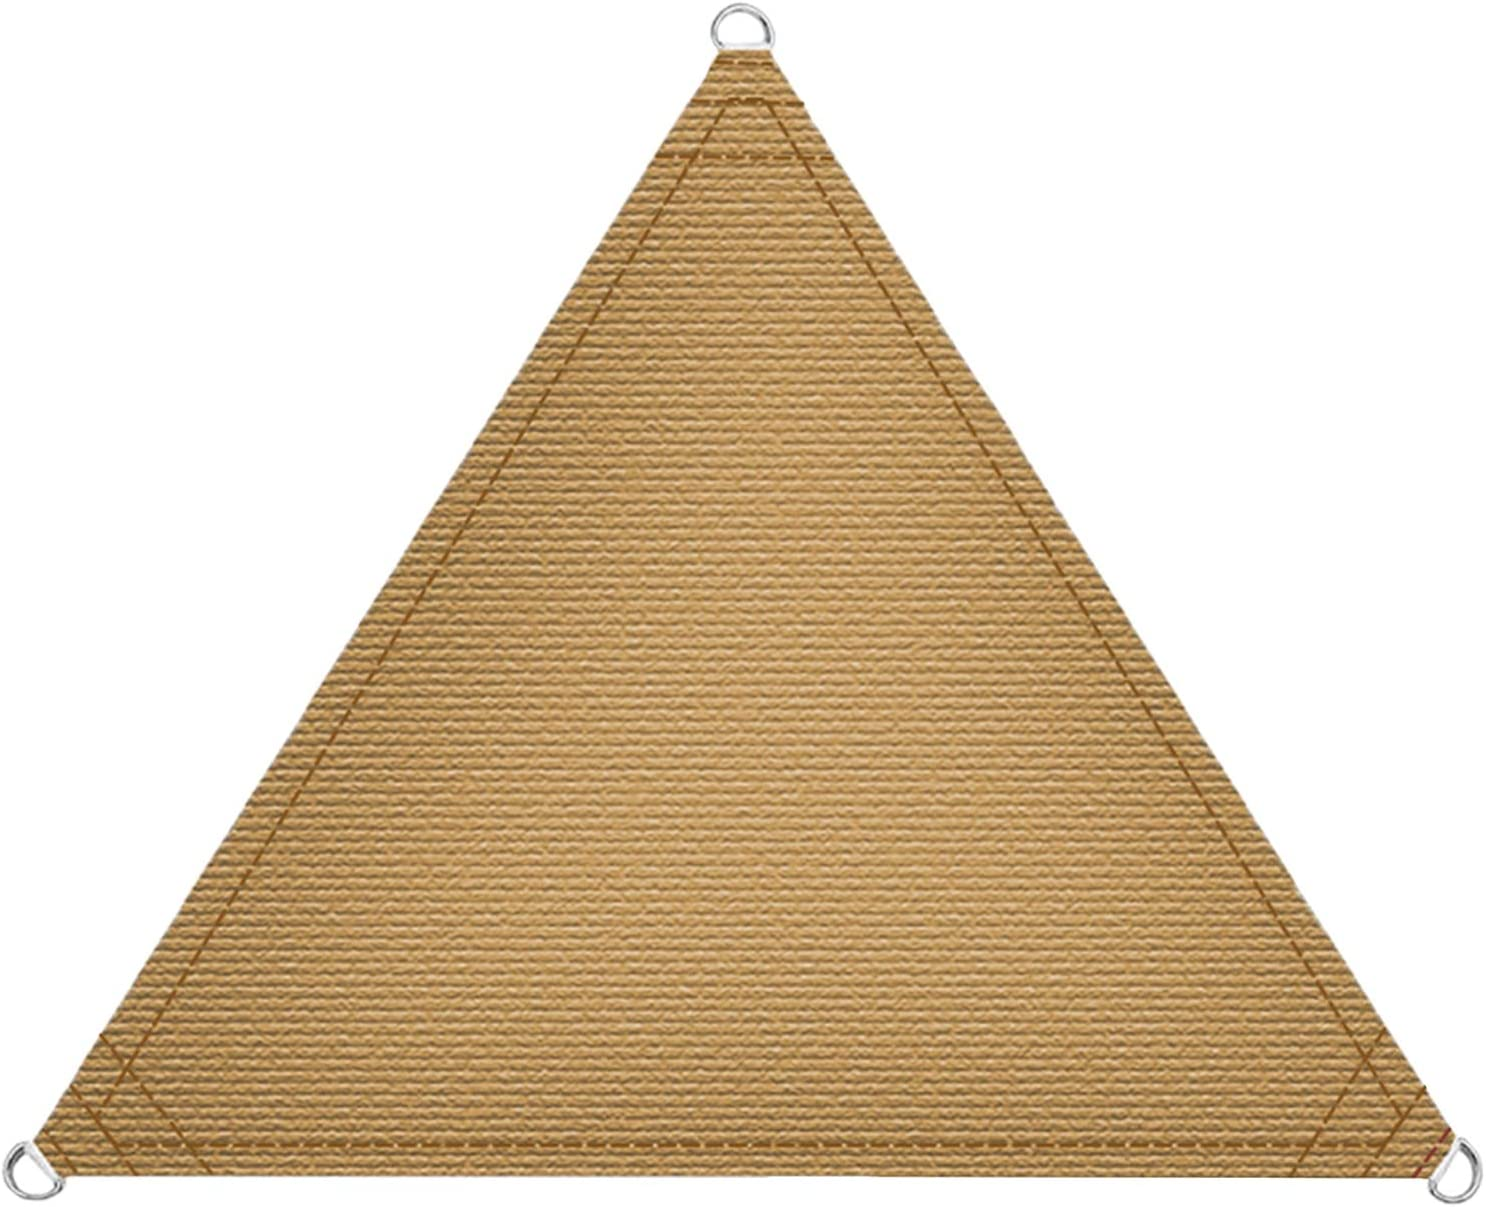 LOVE STORY 12' x 12' x 12' Triangle Straight Sides Sand Sun Shade Sail Canopy UV Block Awning for Outdoor Patio Garden Backyard